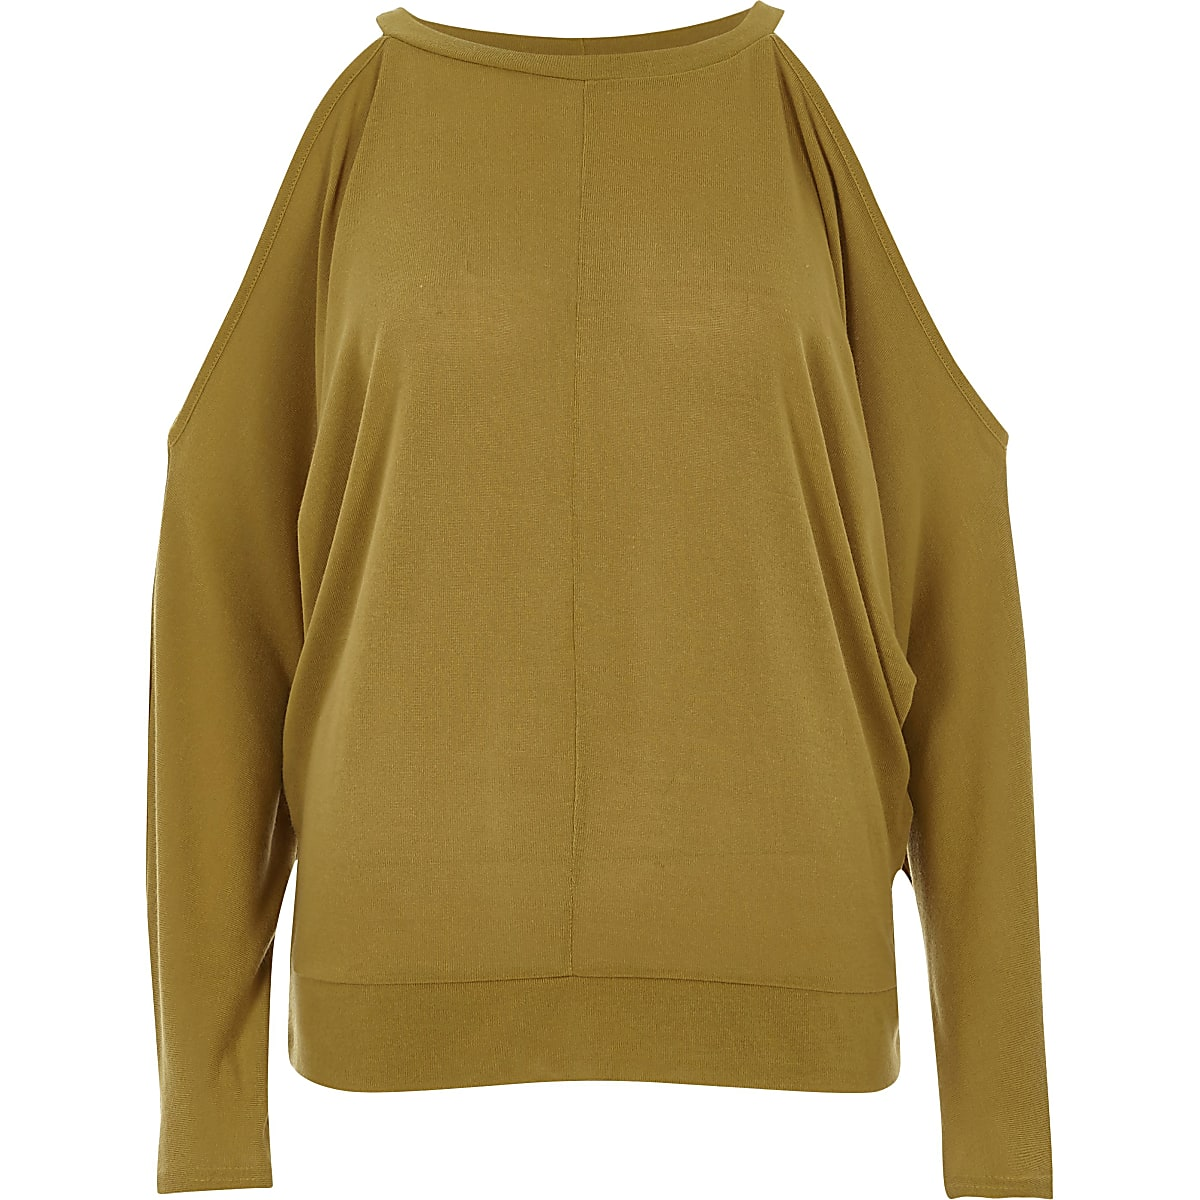 6f947bdb90c4f4 Dark yellow cold shoulder batwing top Dark yellow cold shoulder batwing top  ...